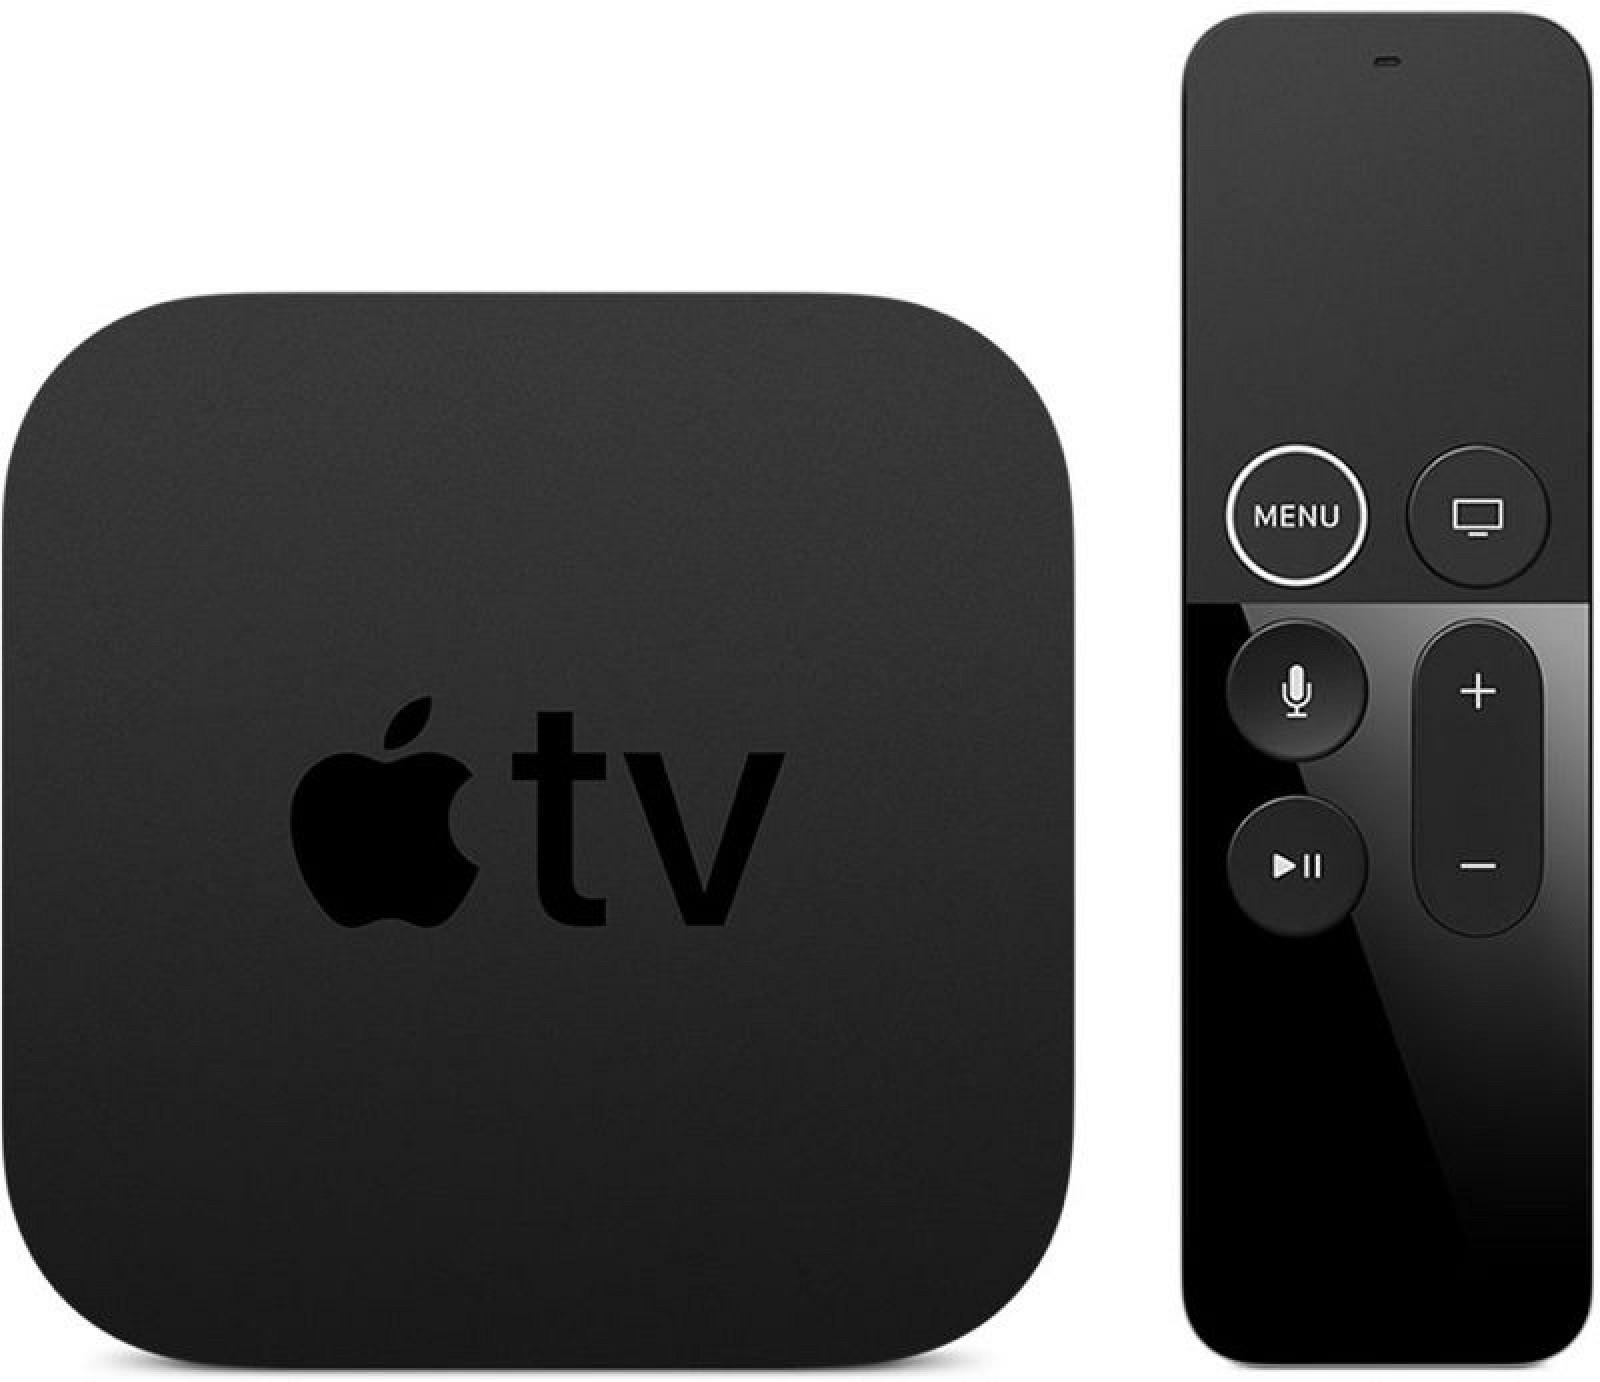 Macrumors Apple Mac Iphone Rumors And News